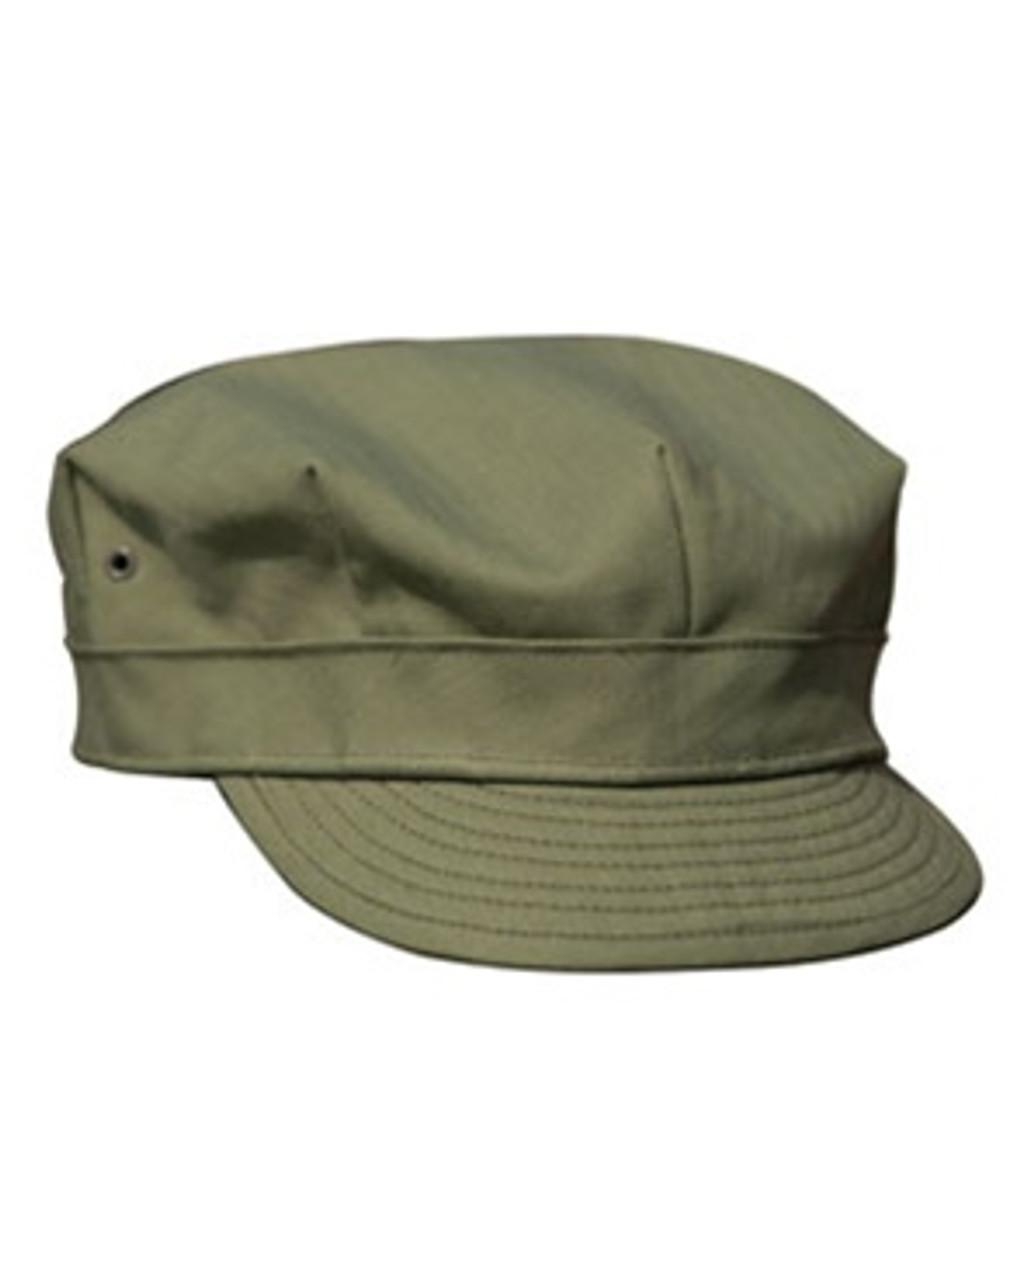 US WWII HBT Cap from Hessen Antique